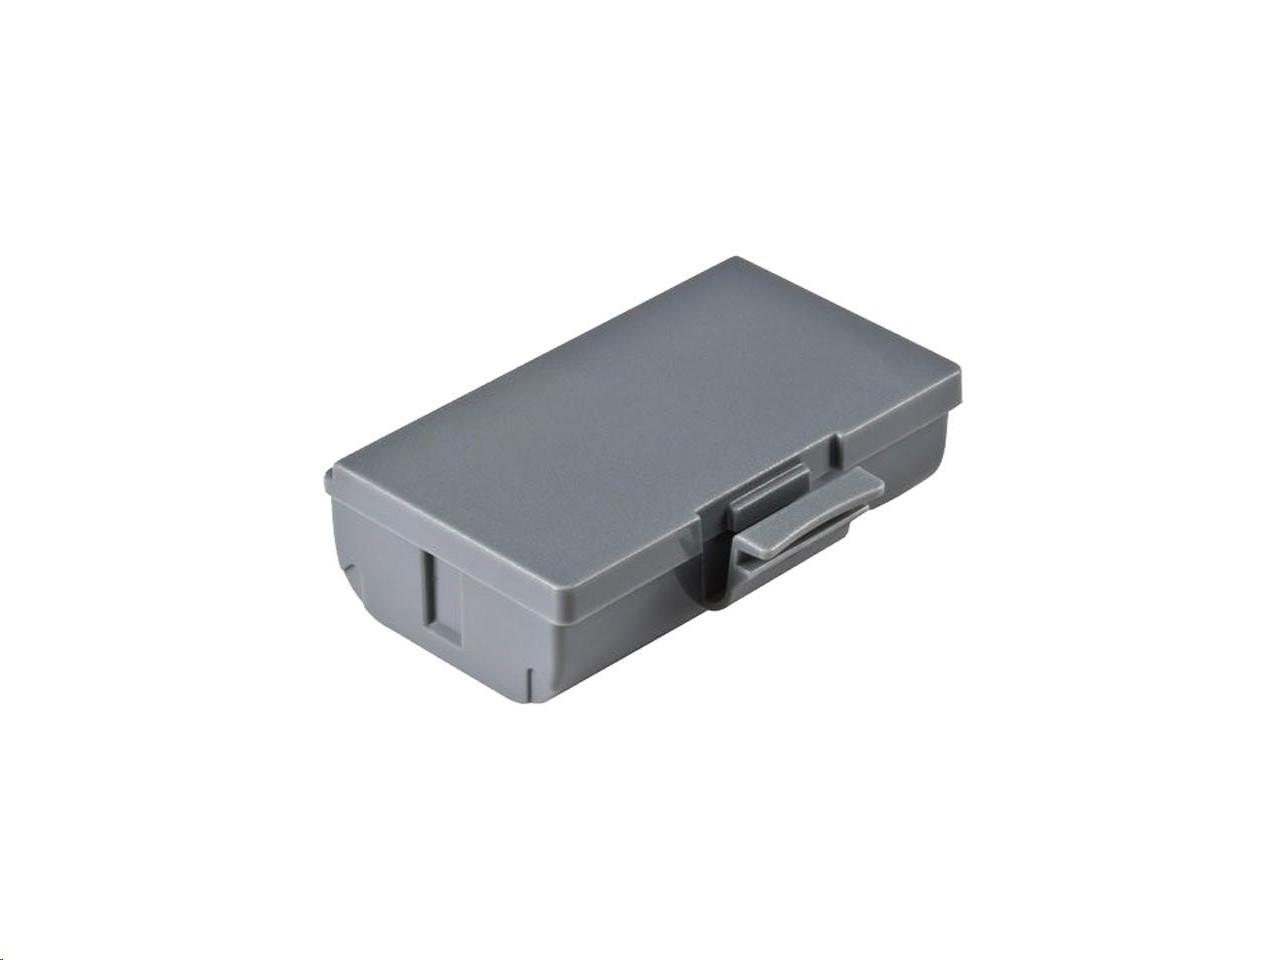 Honeywell Genuine Battery Pack 7.2V 2.30Ah 318-030-003FRE For PB2X PB3X Series